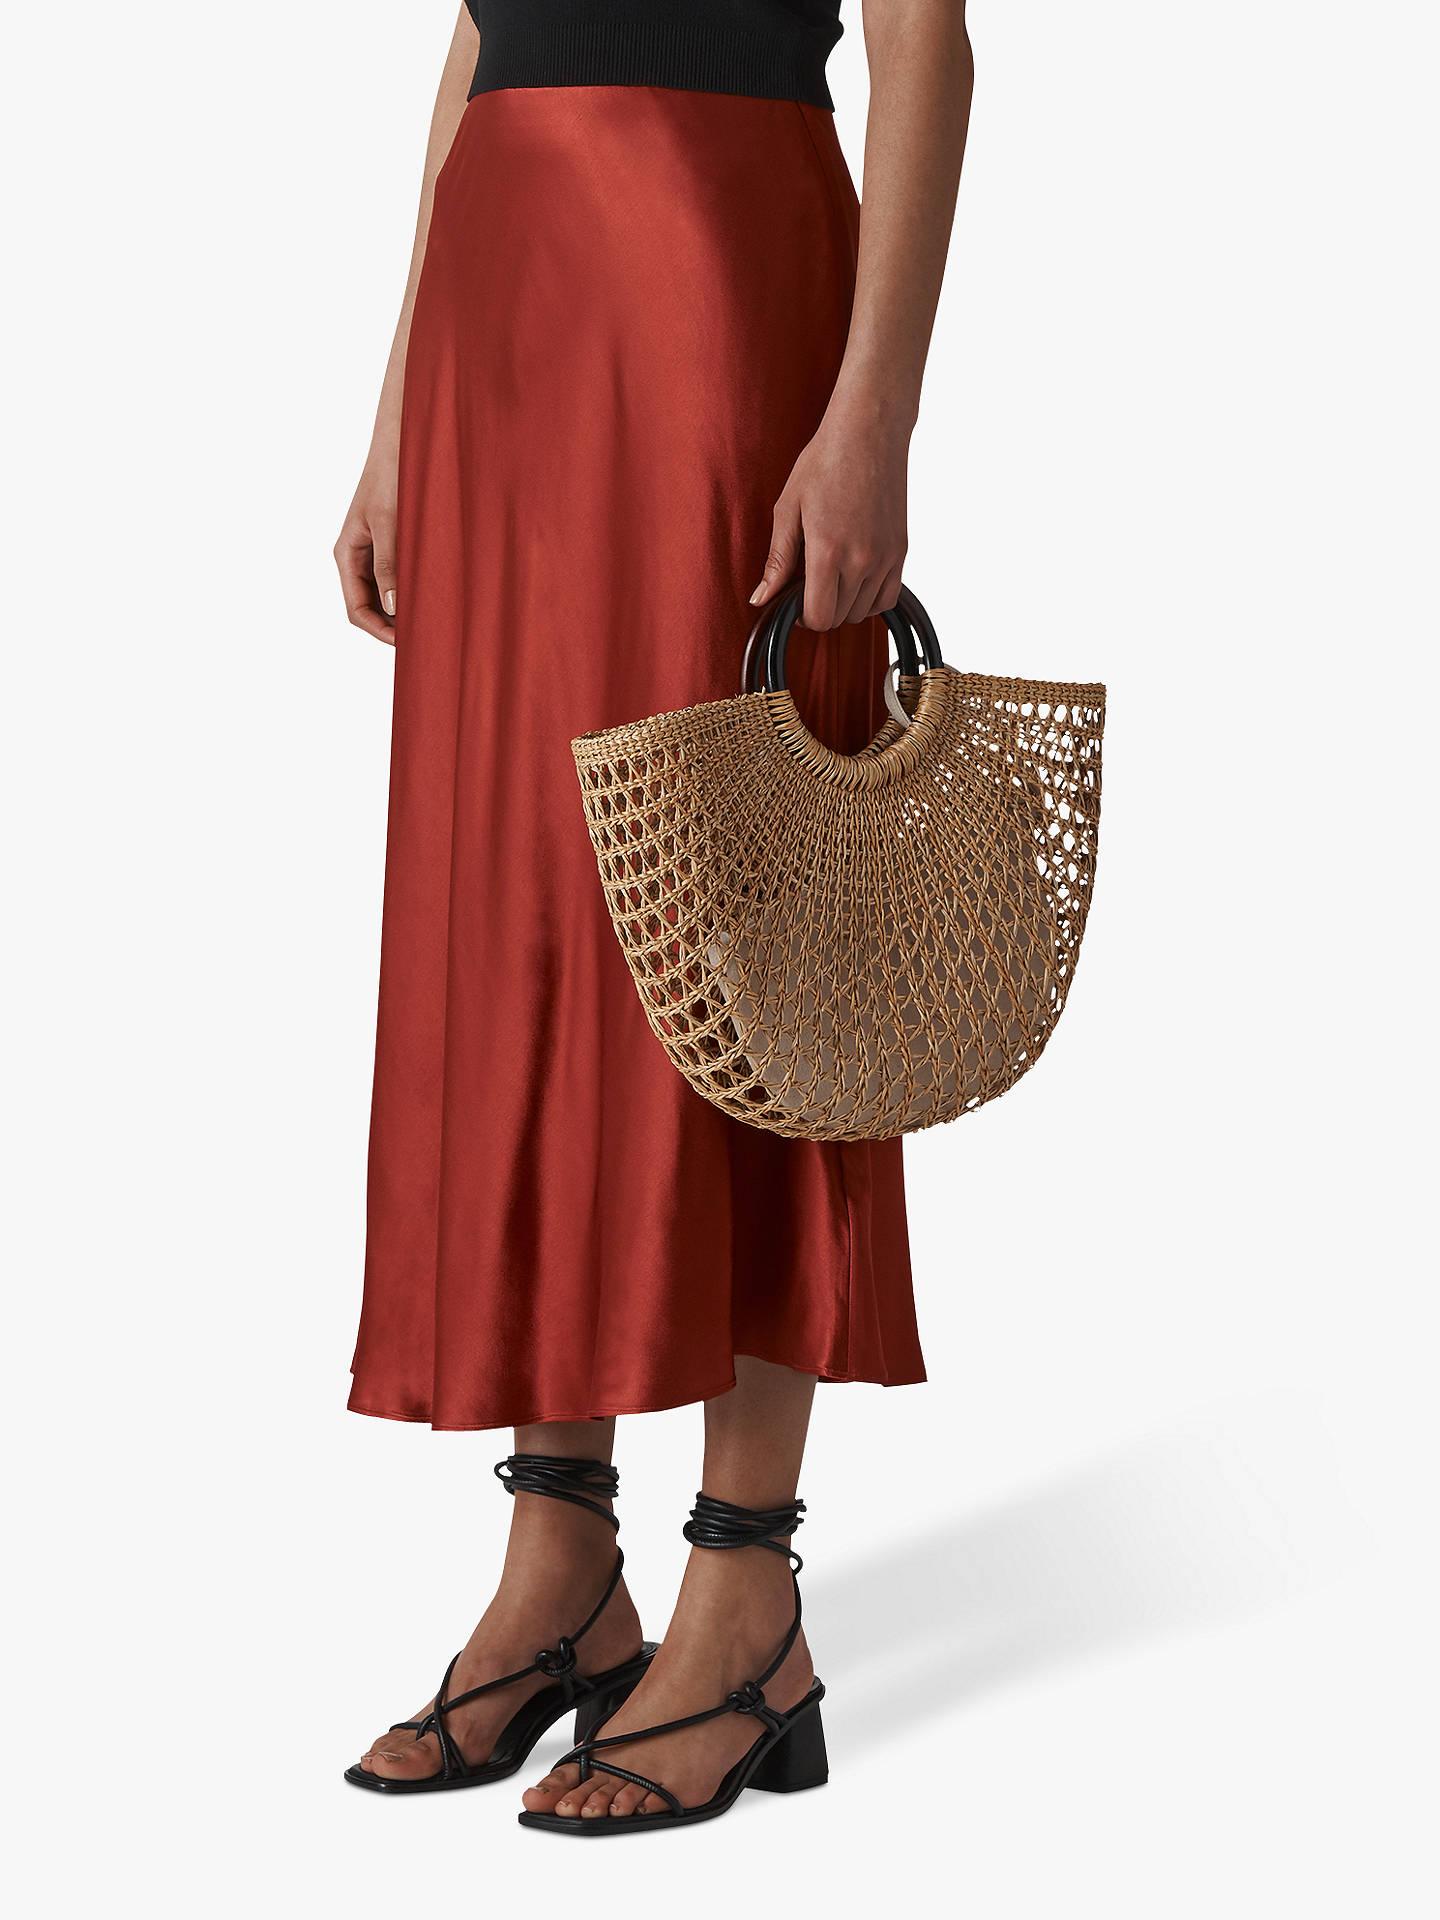 0b7e28e83f Buy Whistles Satin Bias Cut Skirt, Rust, 8 Online at johnlewis.com ...